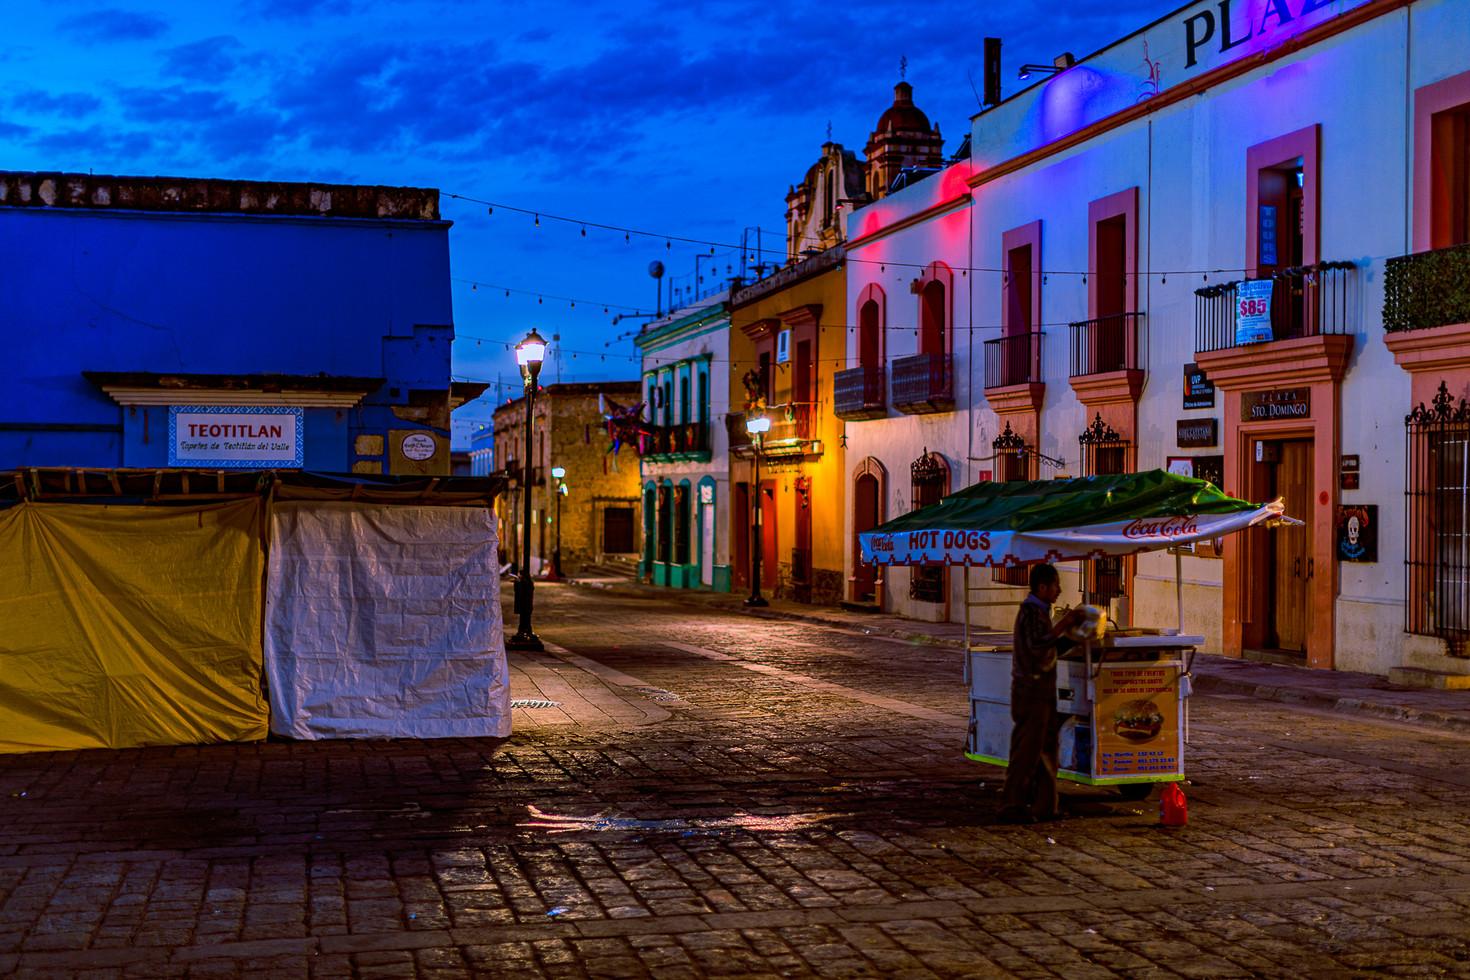 TKPA-Oaxaca201712-0085-HDWH.jpg